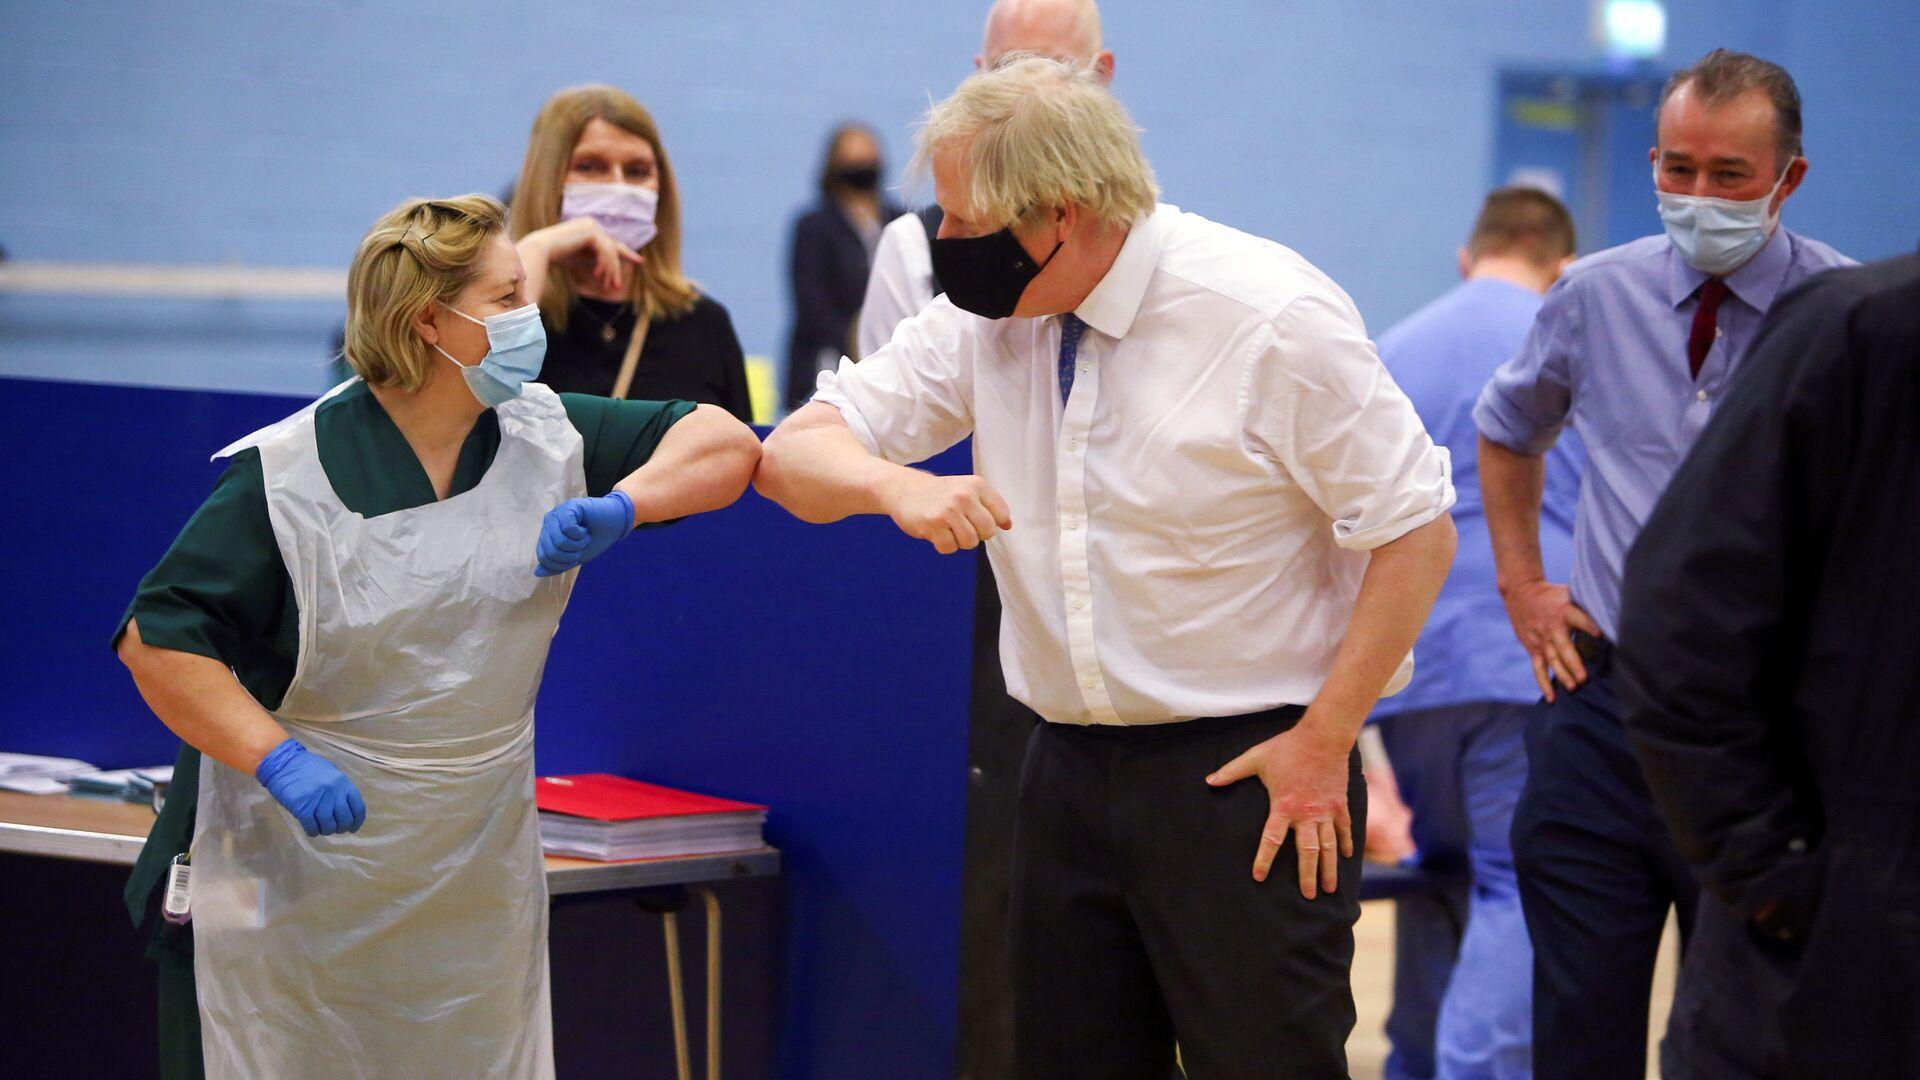 Премьер-министр Великобритании Борис Джонсон с медсестрой во время посещения центра вакцинации от коронавируса в Кумбране - Sputnik Italia, 1920, 06.07.2021